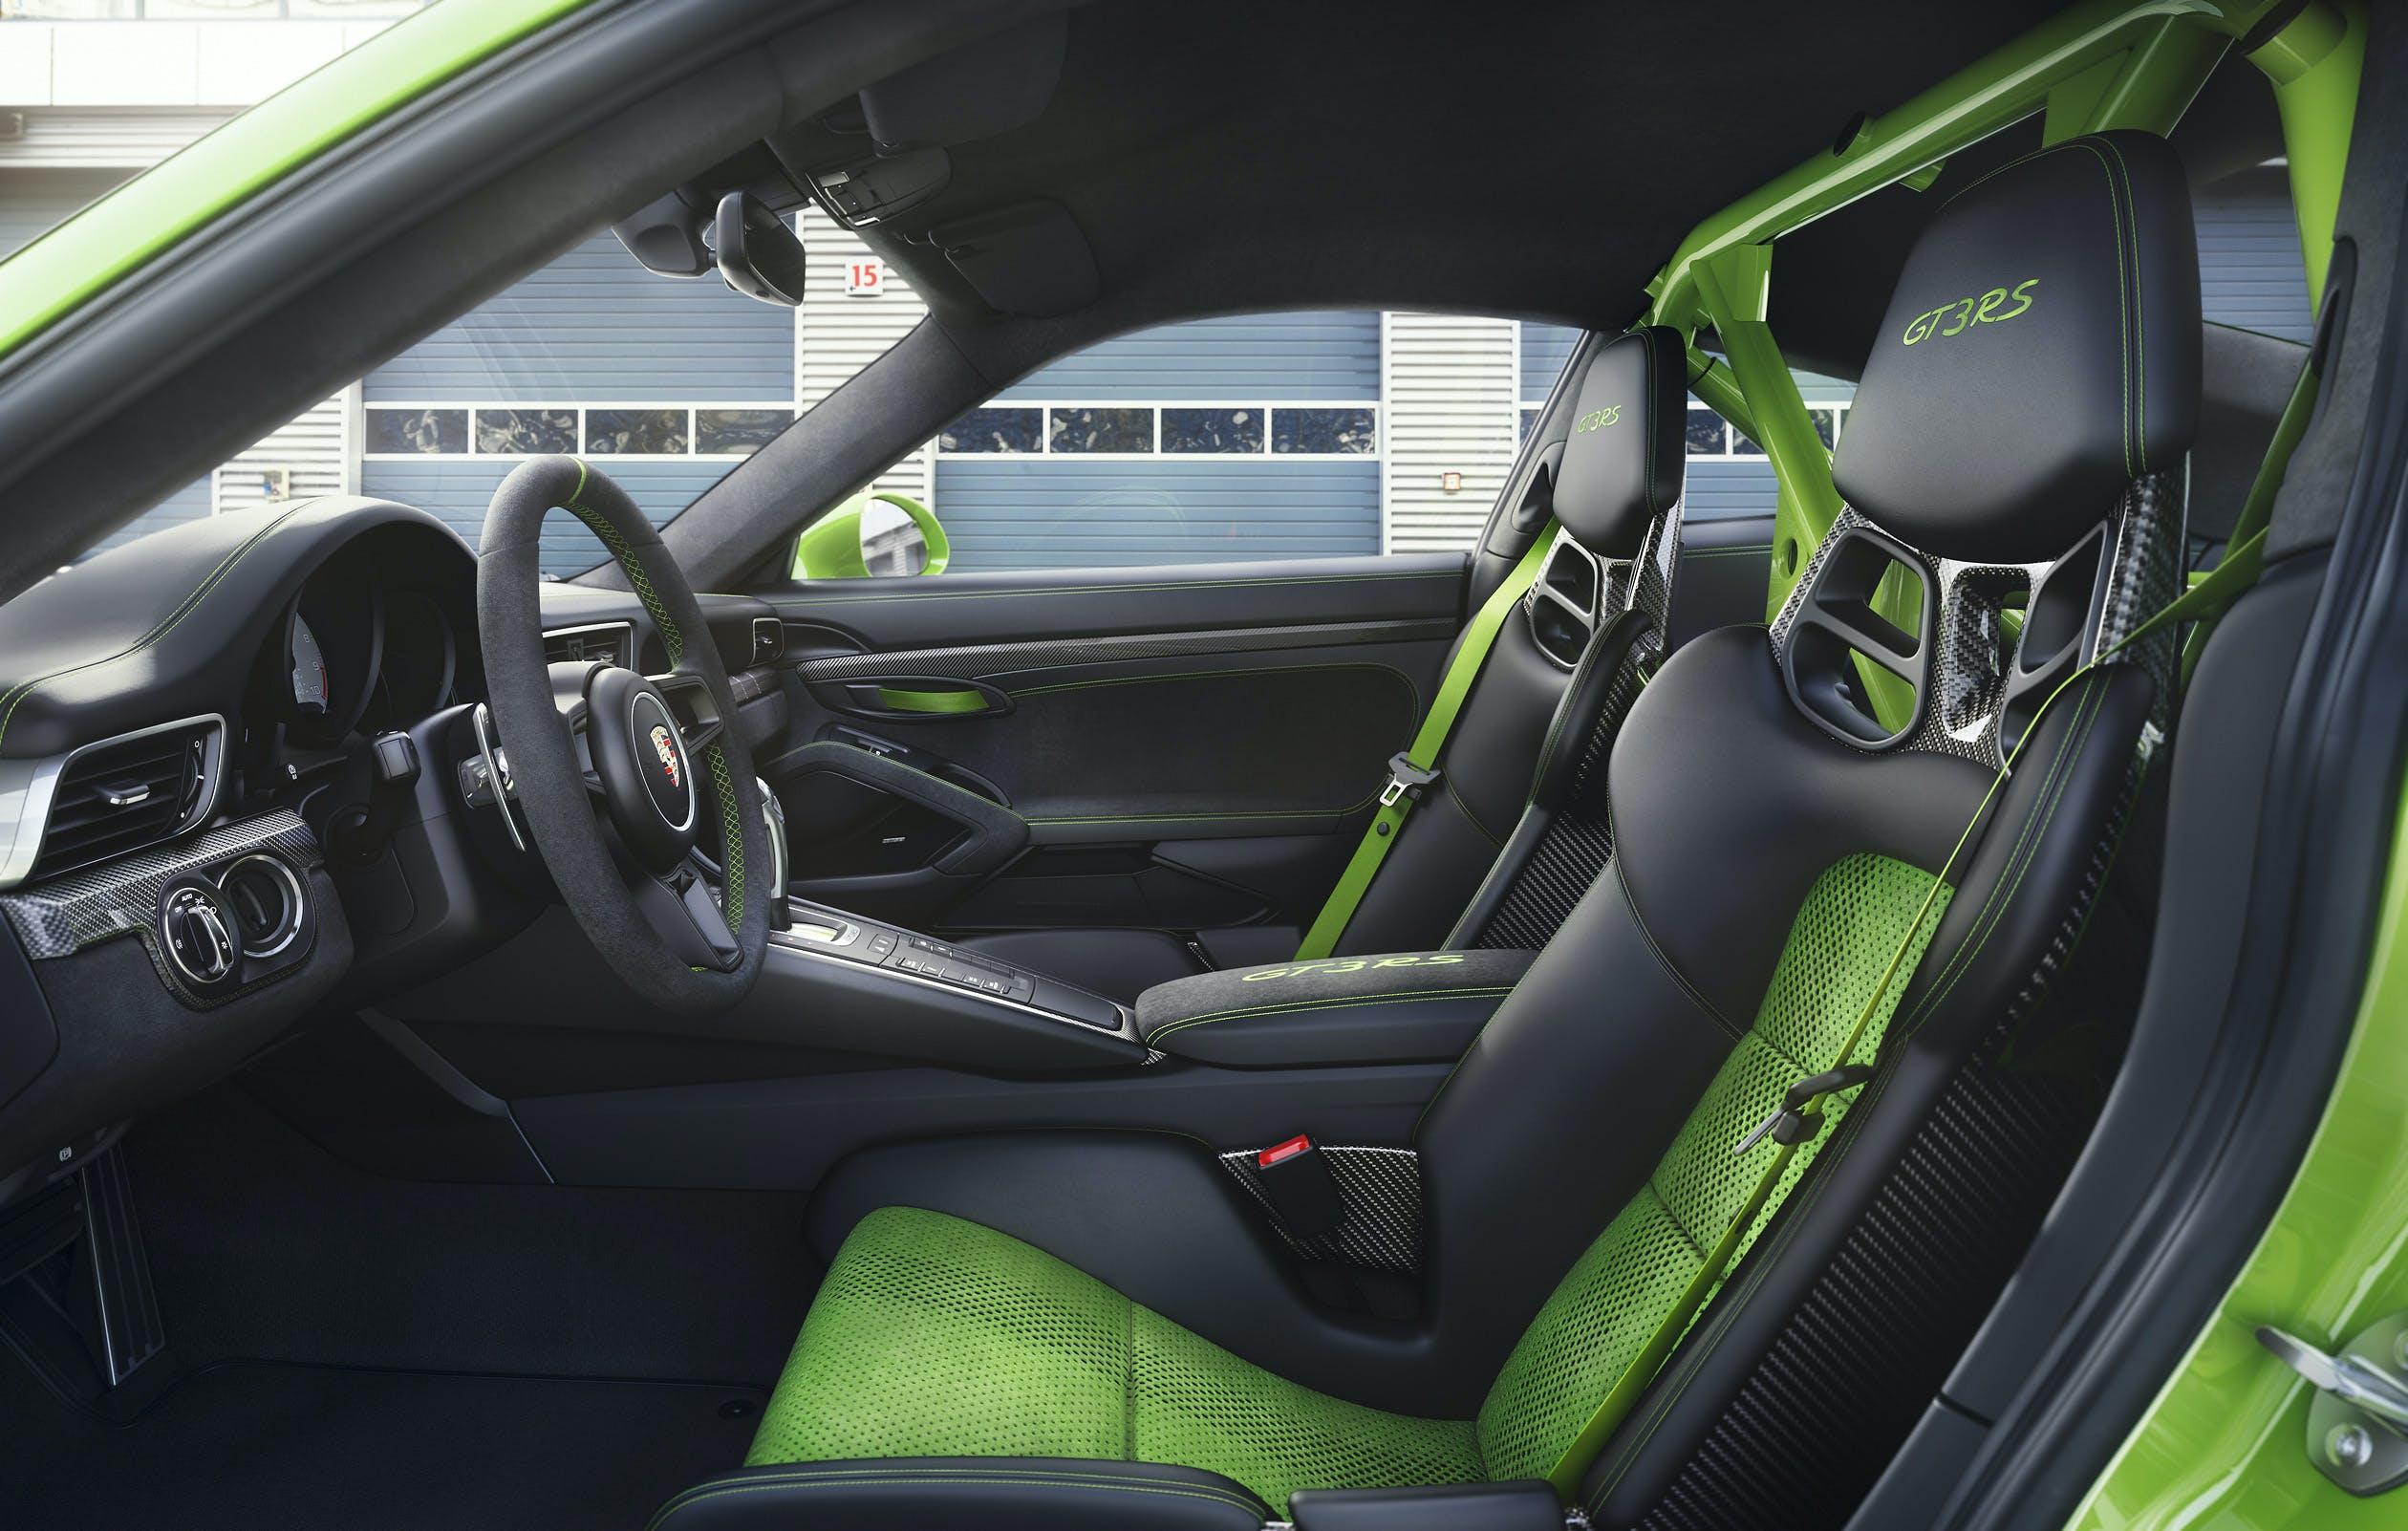 nuova porsche 911 gt3 rs sedili racing abitacolo